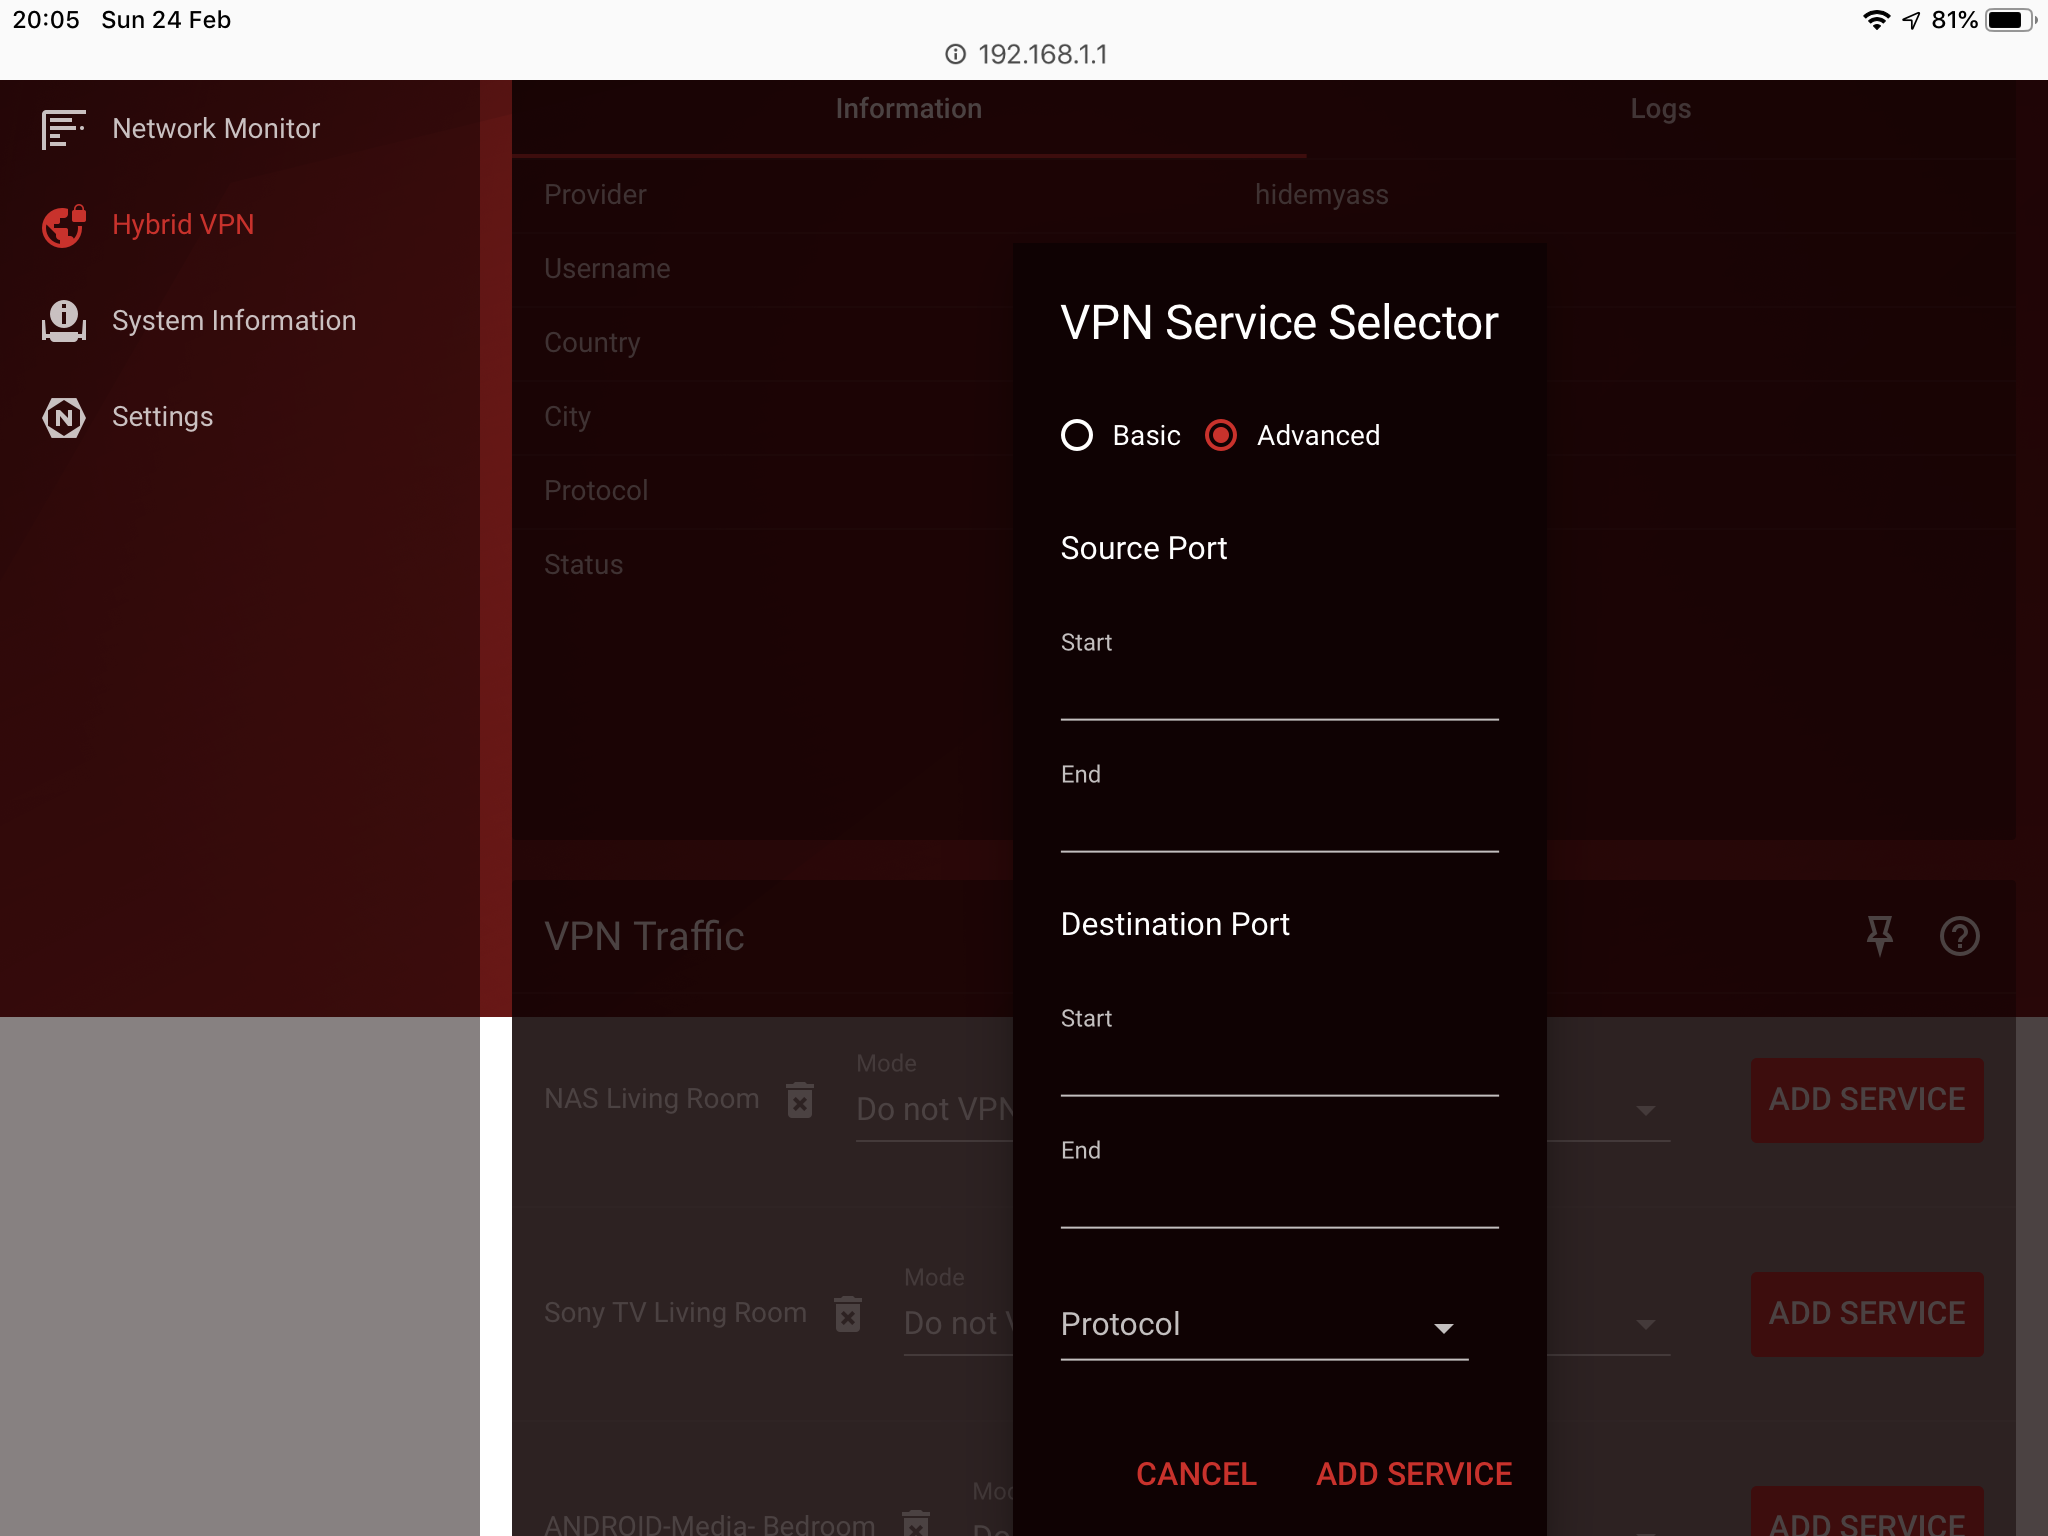 Hybrid VPN Setup Guide - NETGEAR Communities